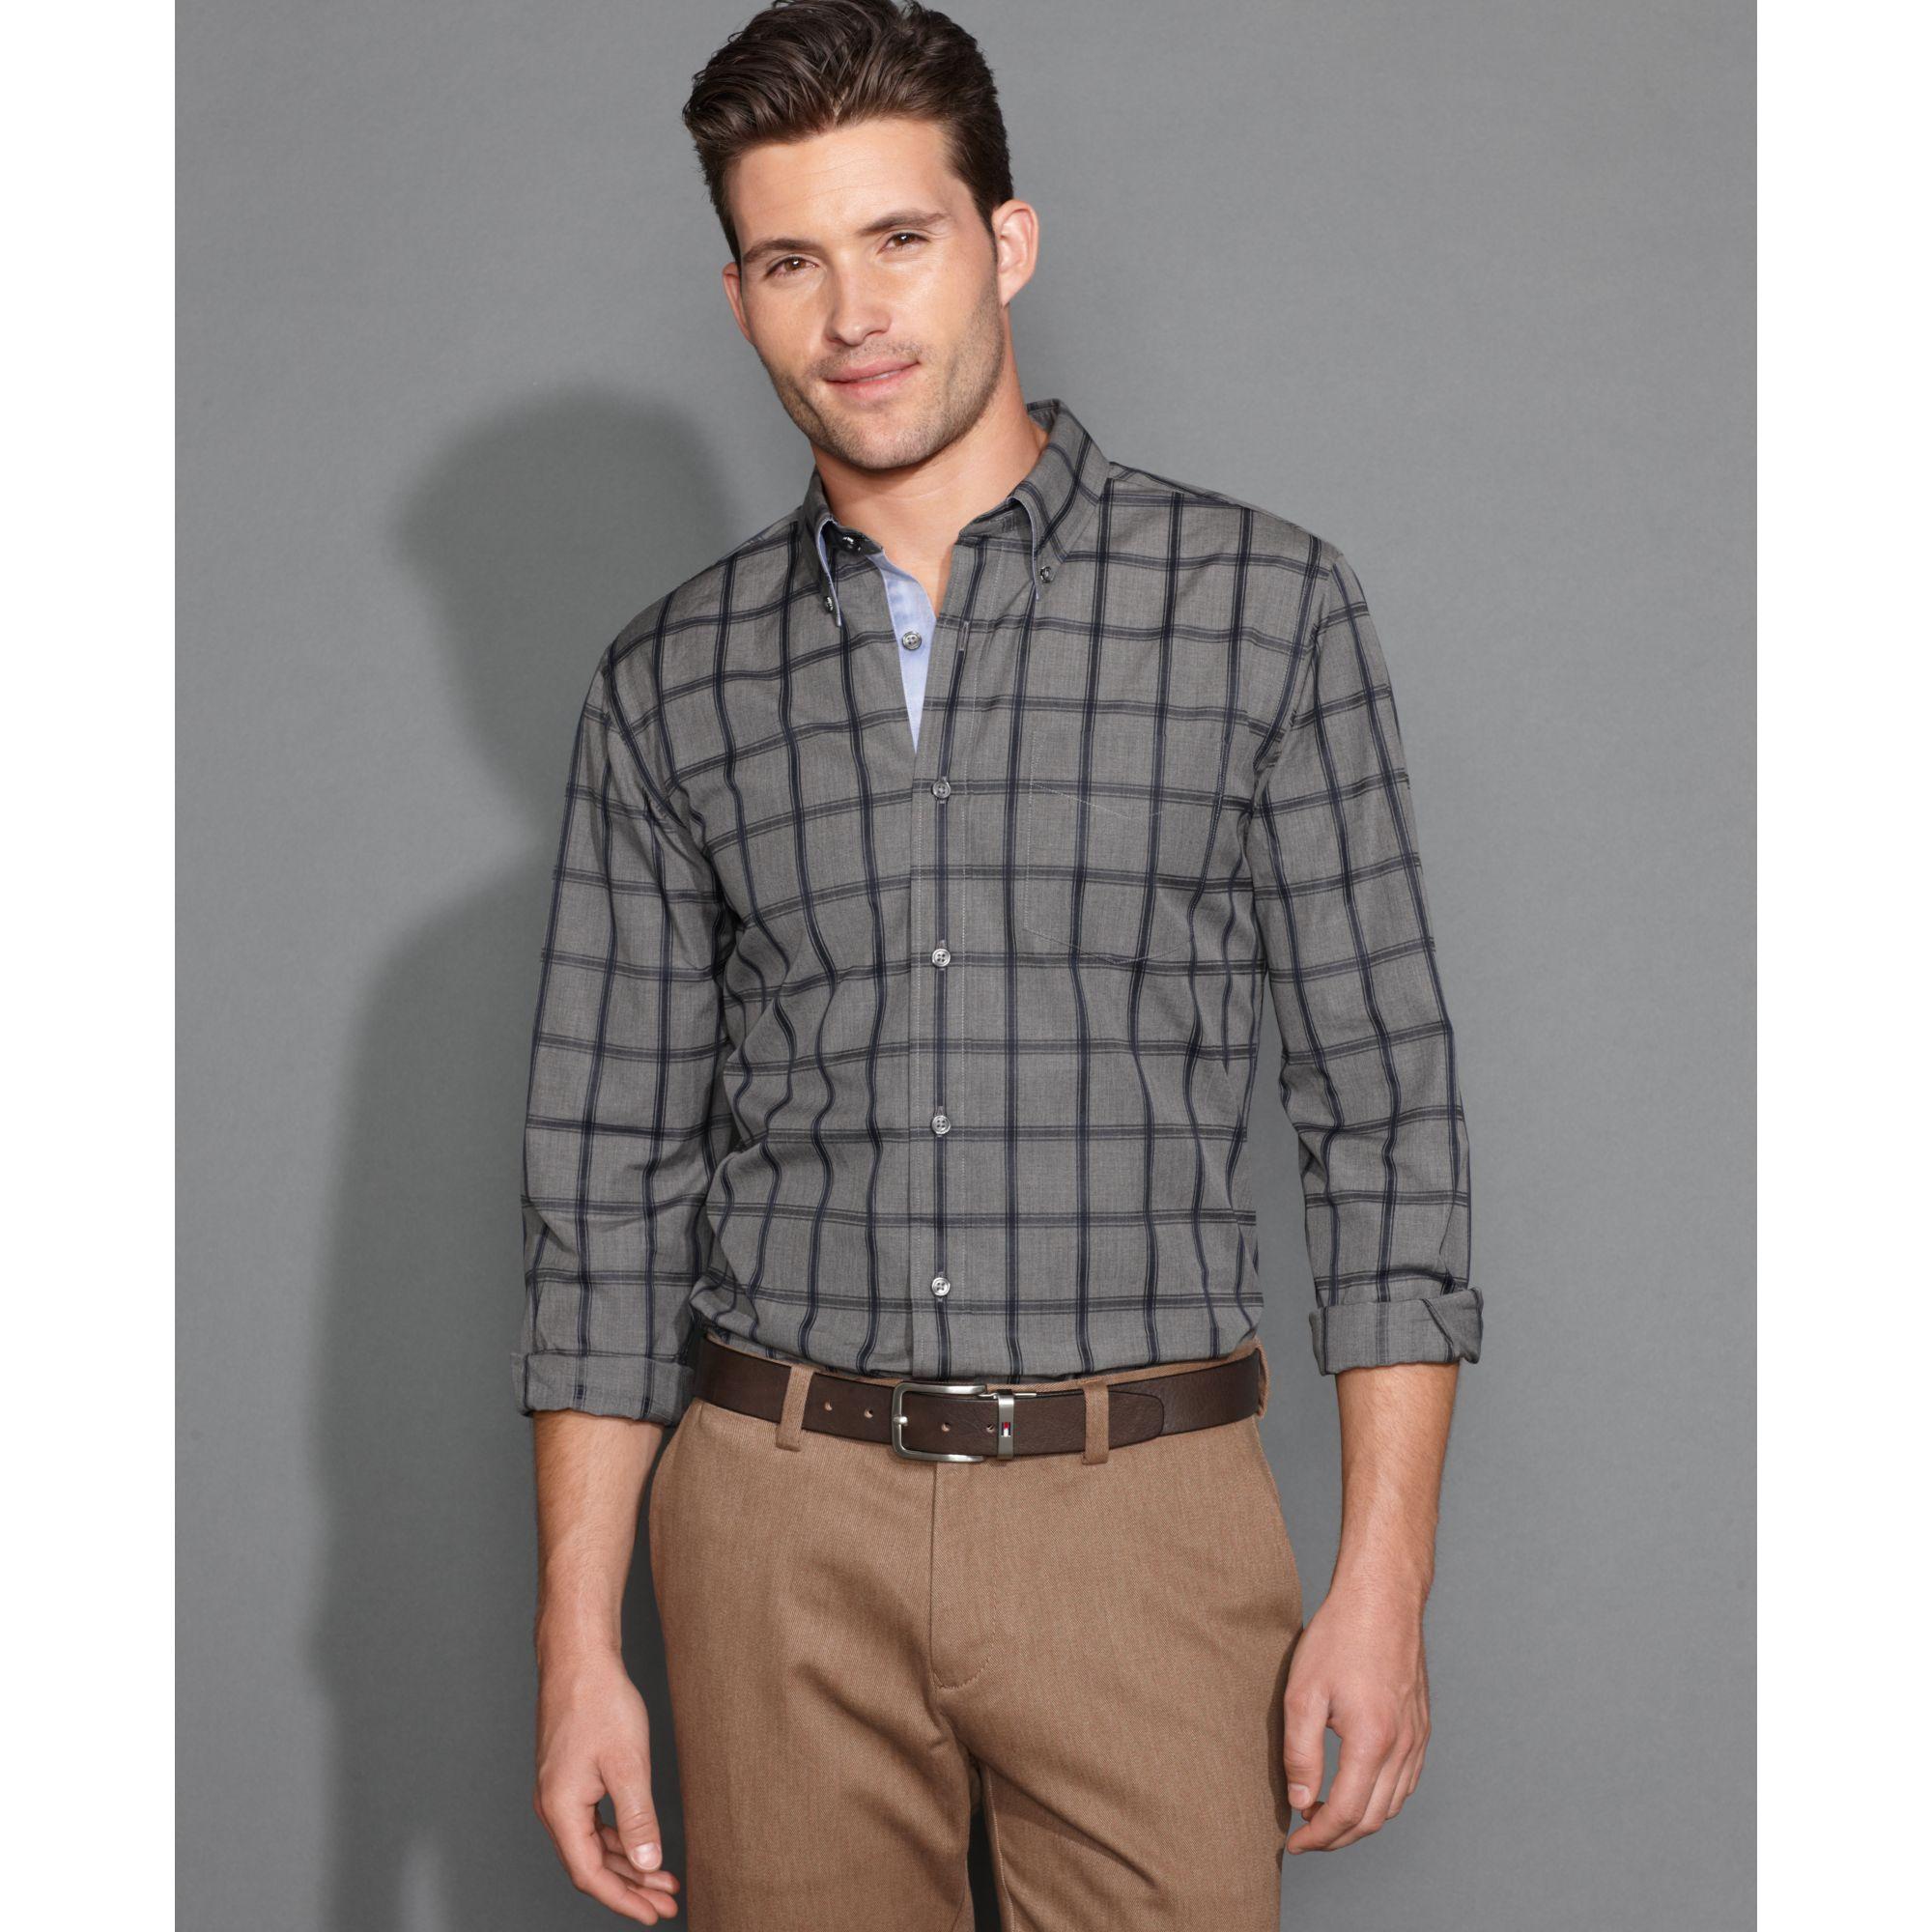 Tommy Hilfiger Long Sleeve Slim Fit Fenn Shirt In Gray For